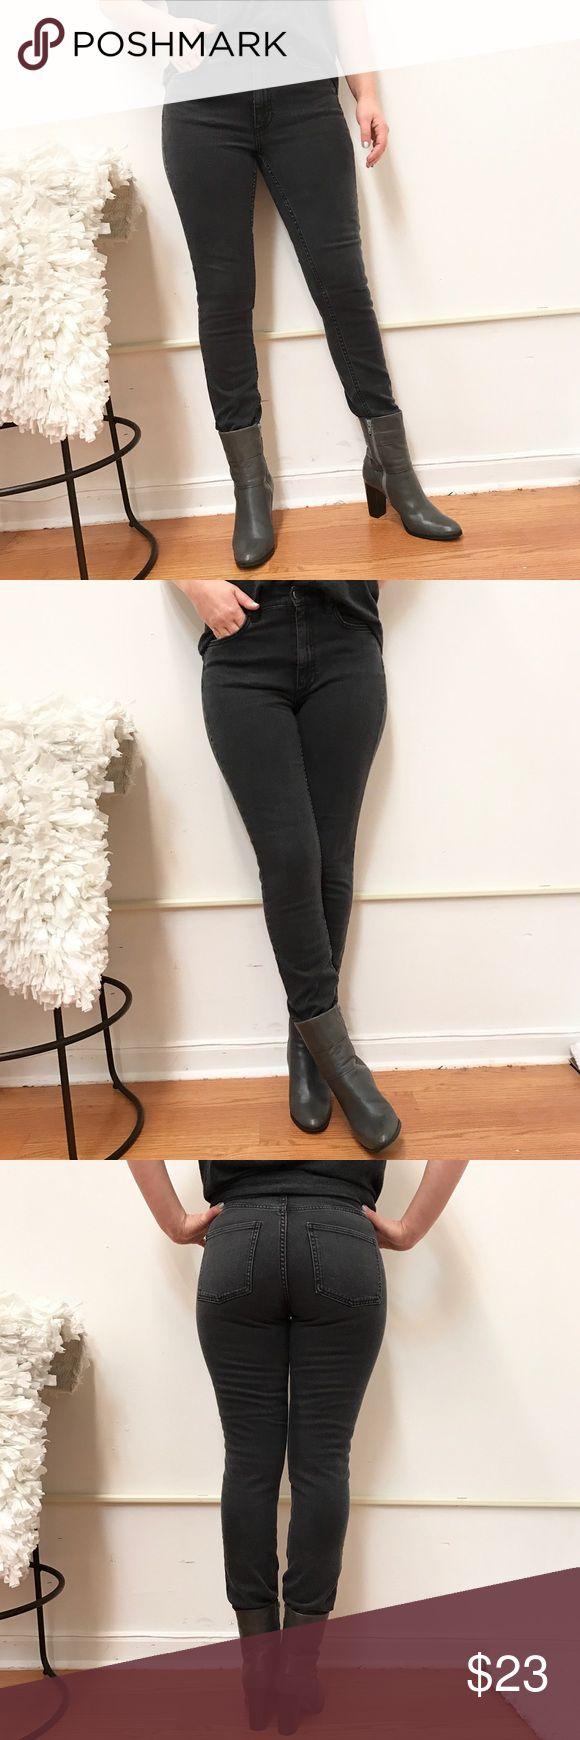 "COS jeans skinny high waist Sz 29 COS skinny high waist jeans. Sz 29. Waist flat across 15"" rise 9.5"" inseam 28"" COS Jeans Skinny"